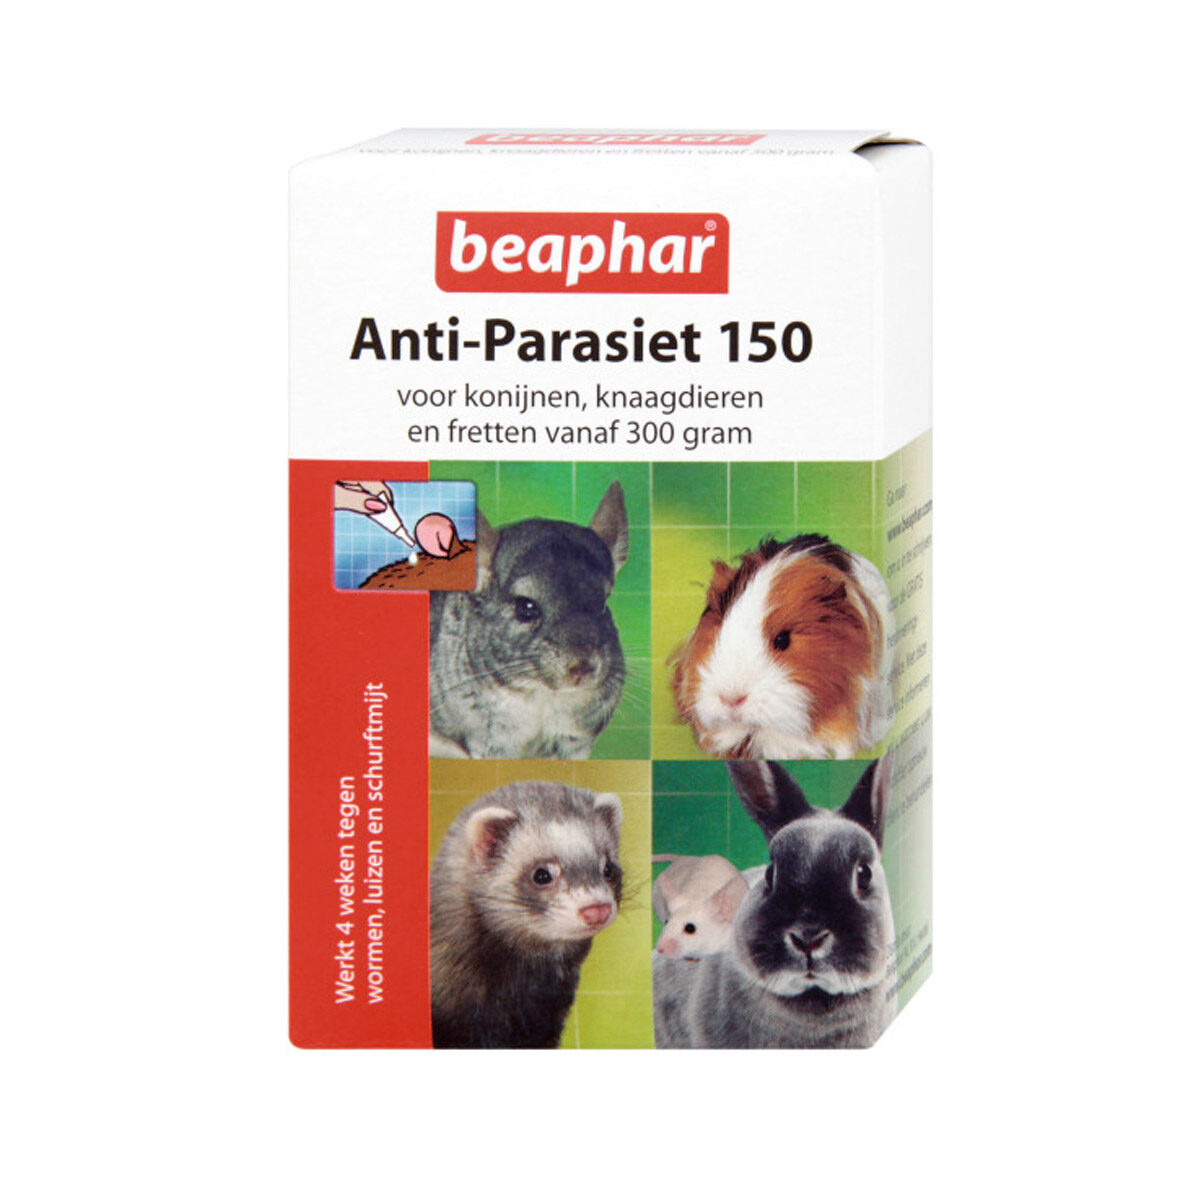 Beaphar Anti-Parasiet 150 Knaagdier 4 st